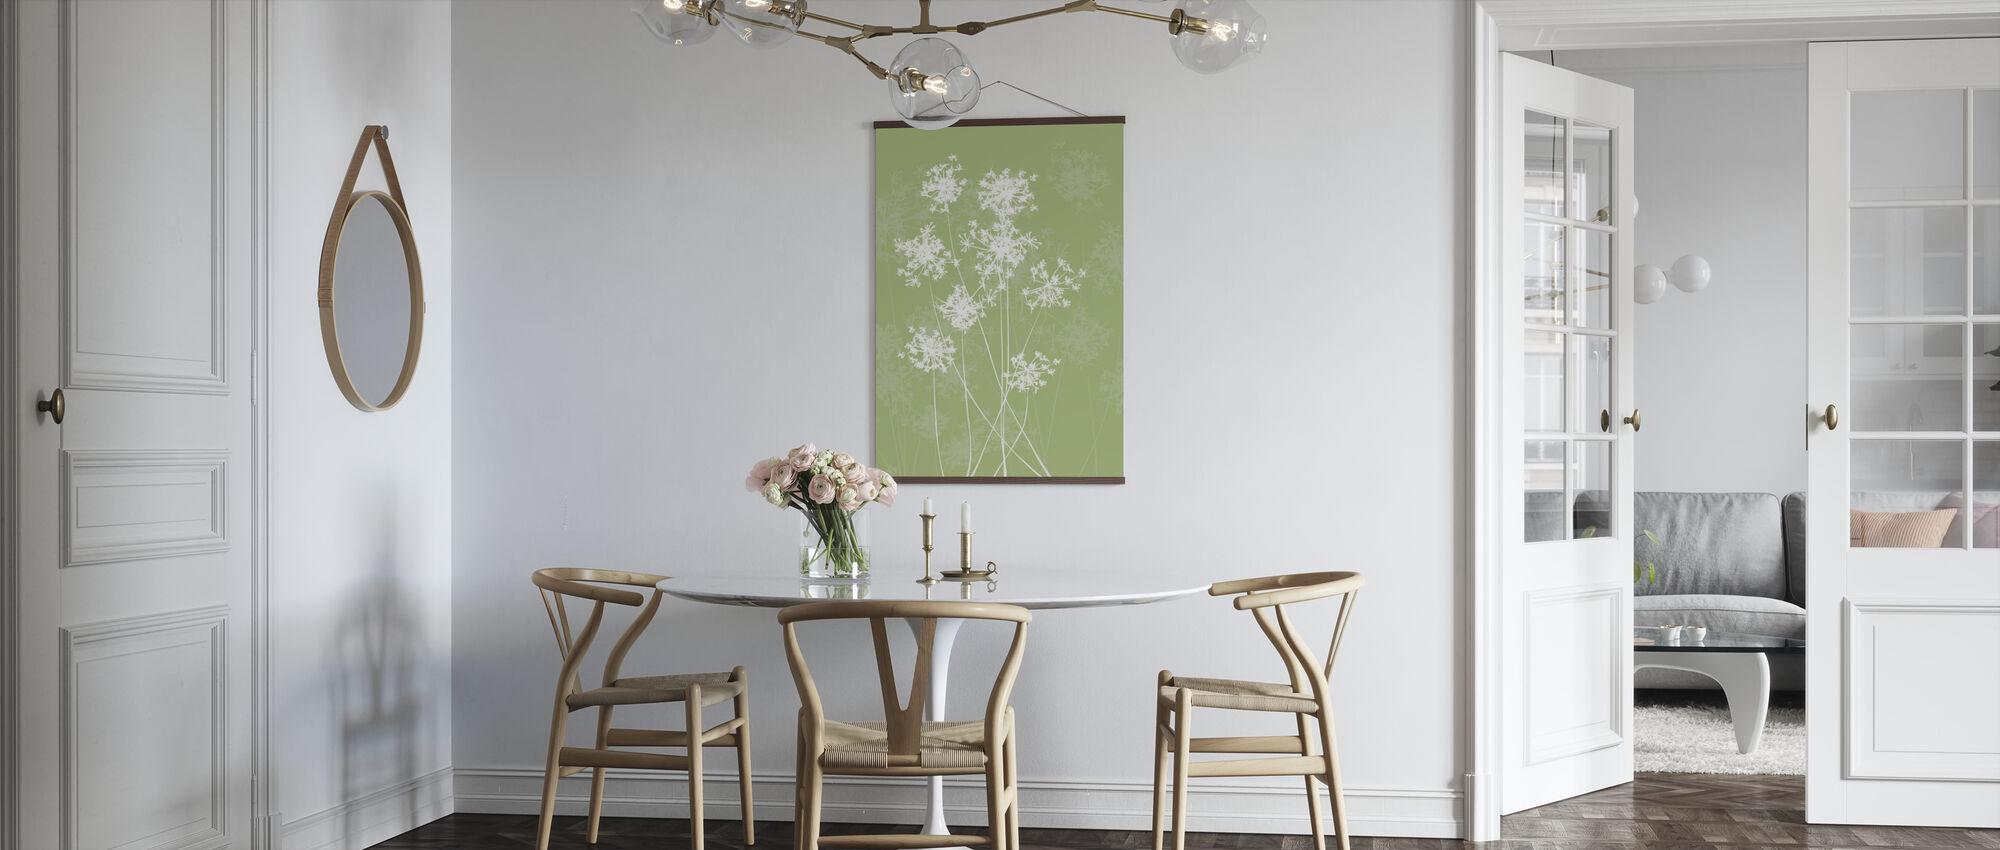 Dandelions - Green - Poster - Kitchen